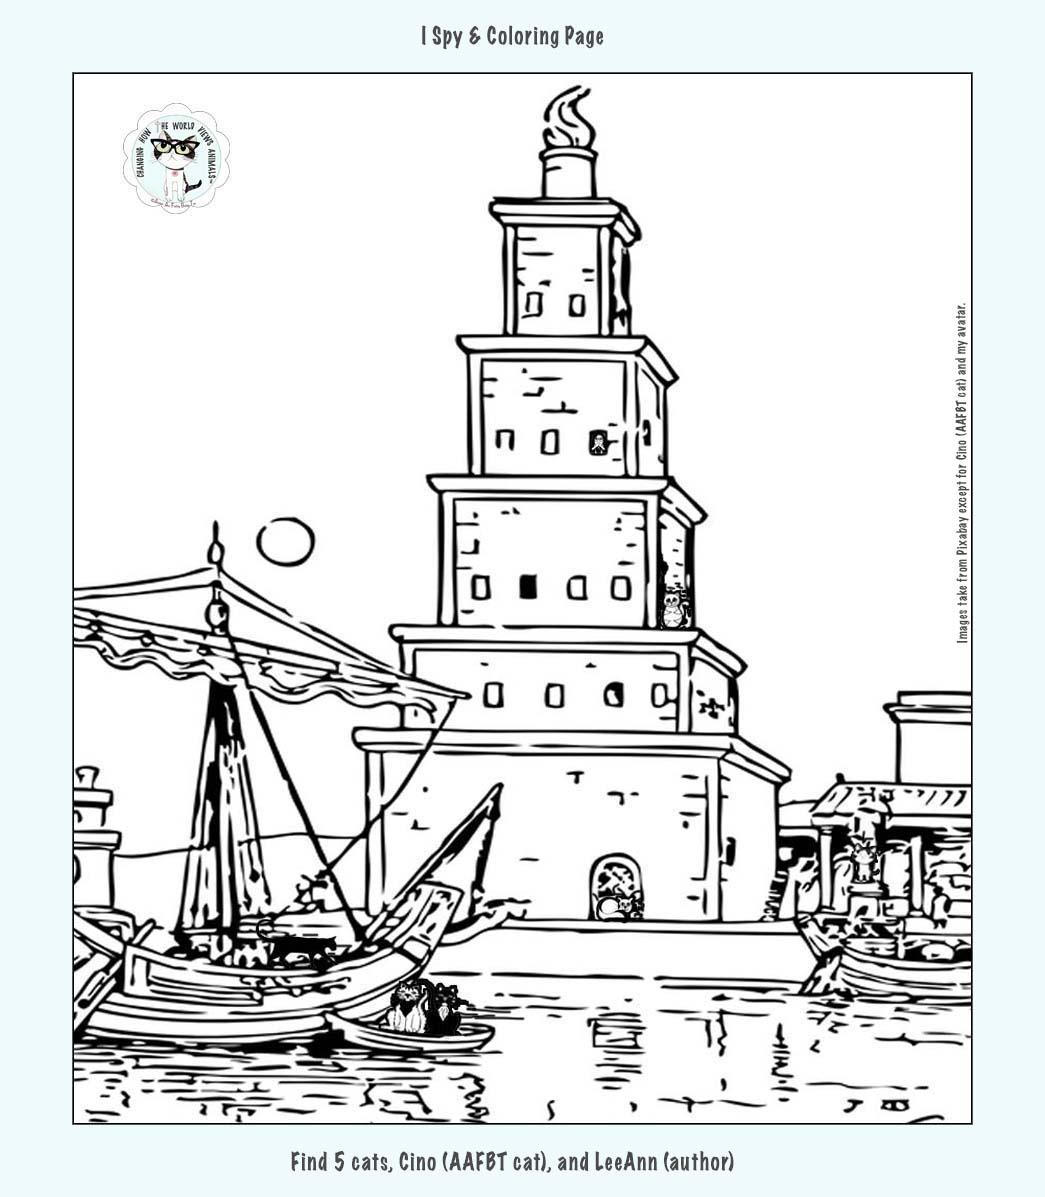 I Spy-Coloring Page-aafbt